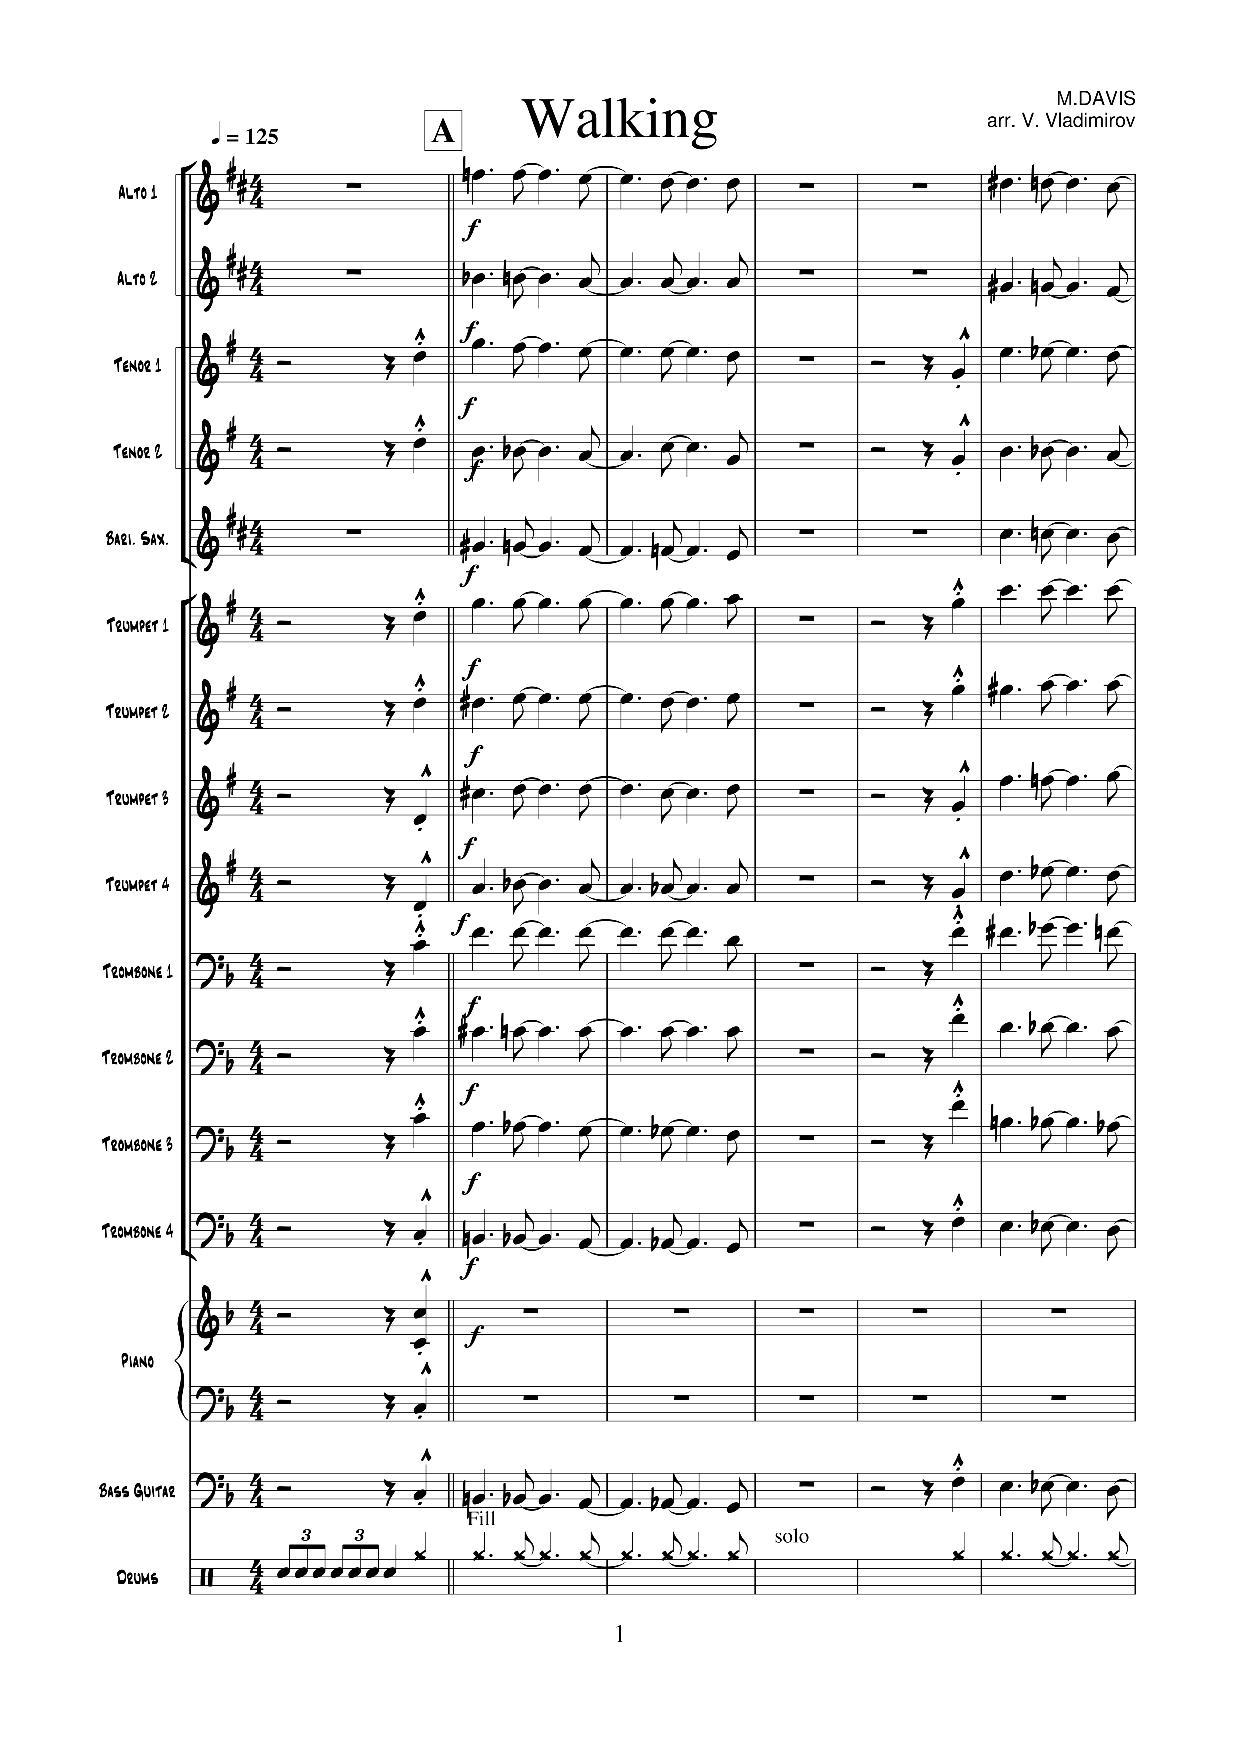 M.Davis Walking (arr.V.Vladimirov) page1